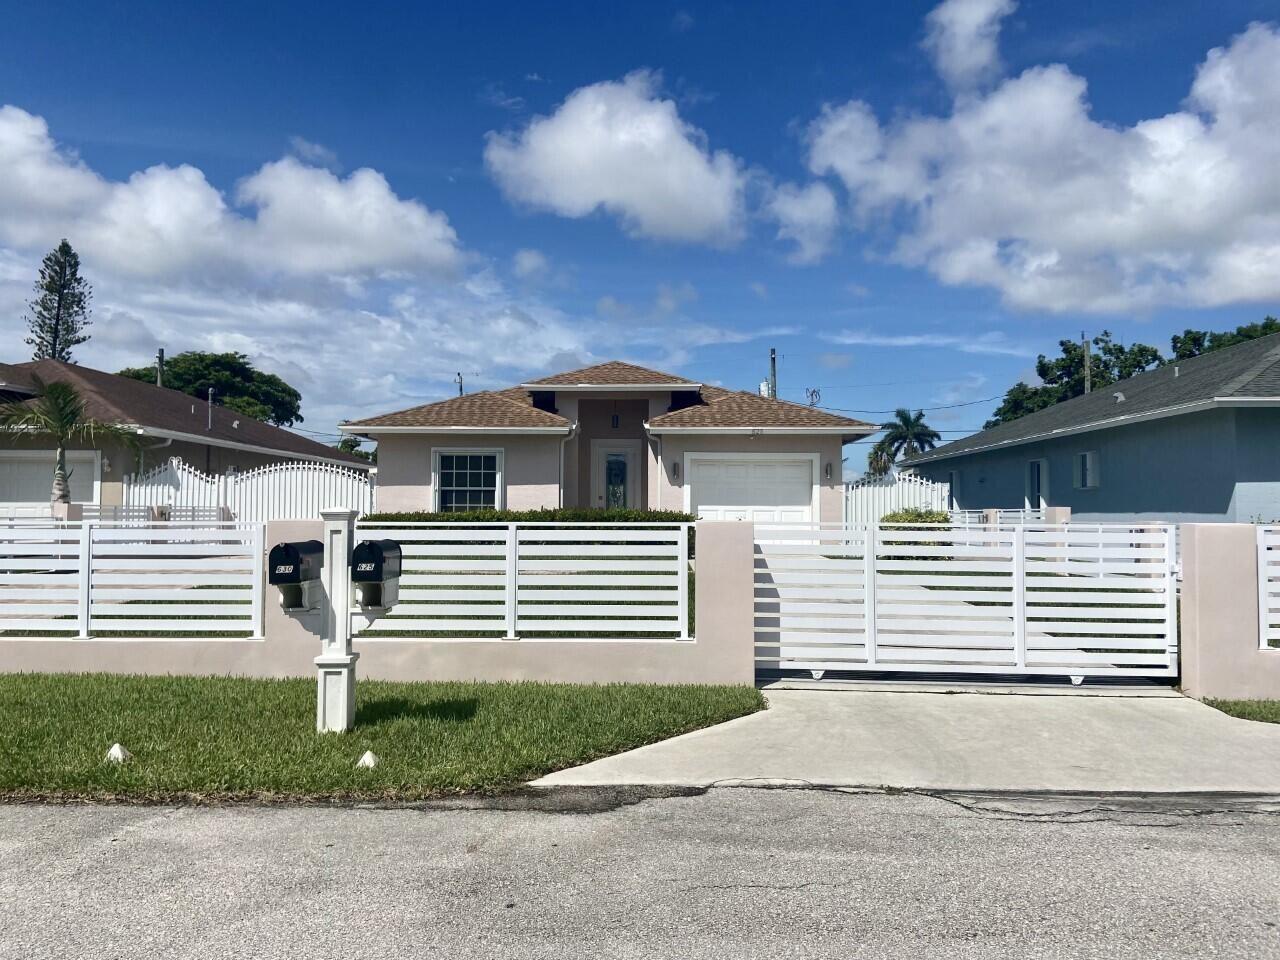 625 Mercury St, West Palm Beach, FL 33406 - MLS#: RX-10745770